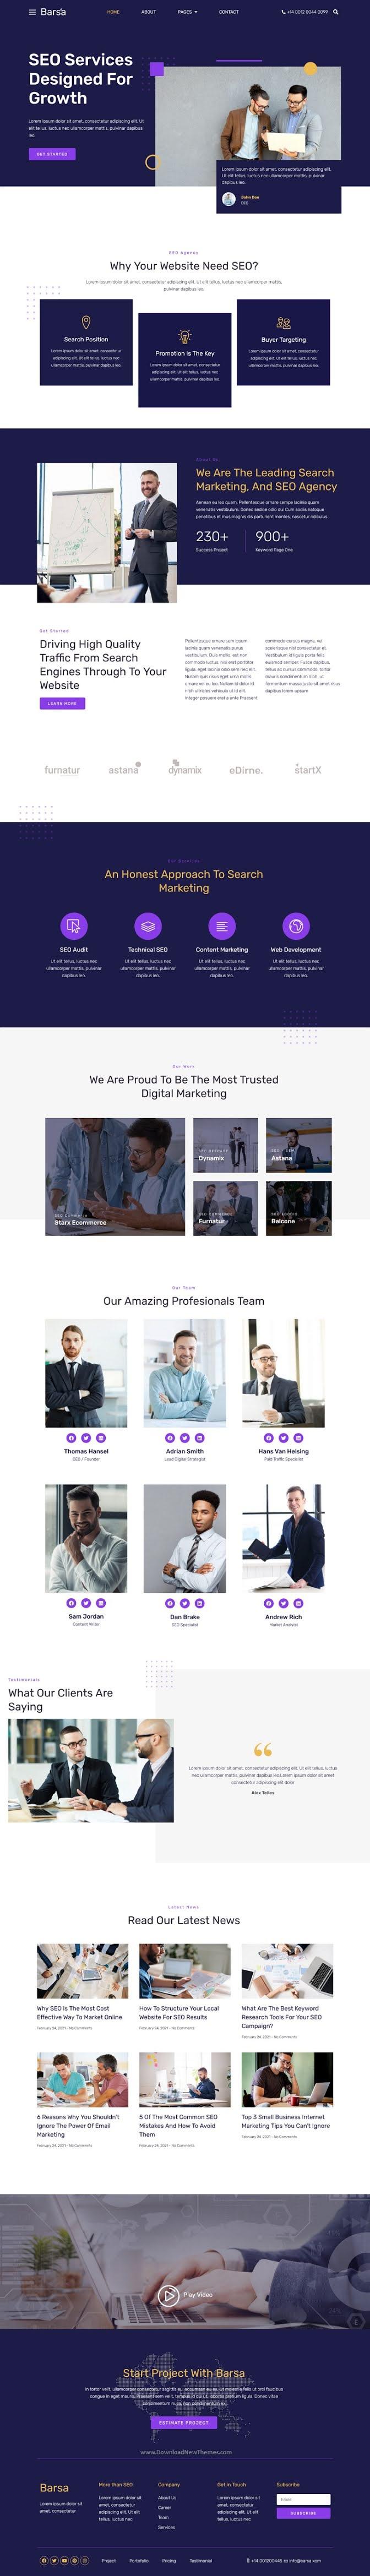 SEO & Digital Marketing Agency Template Kit